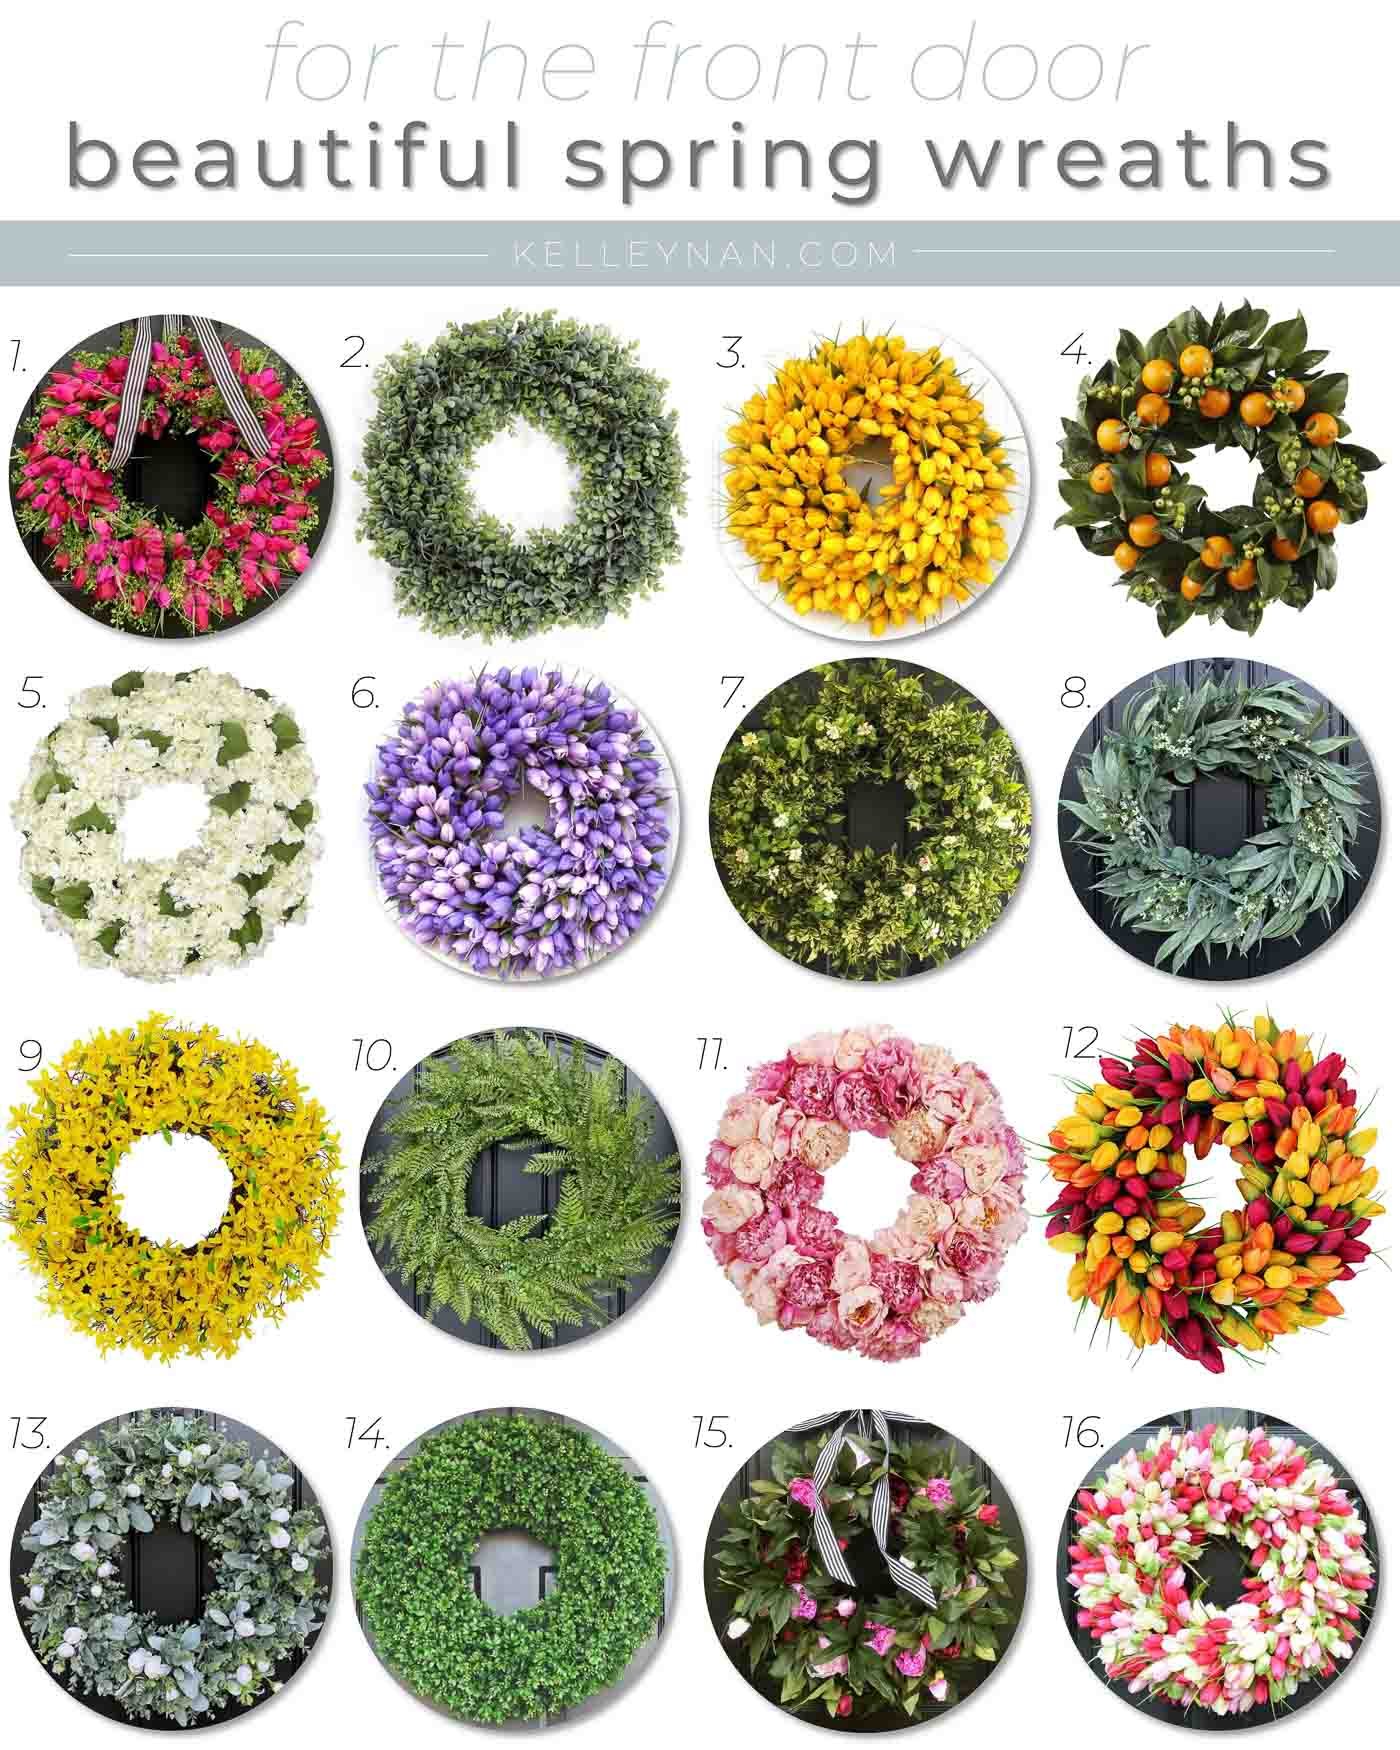 16 Beautiful Spring Wreaths for the Front Door